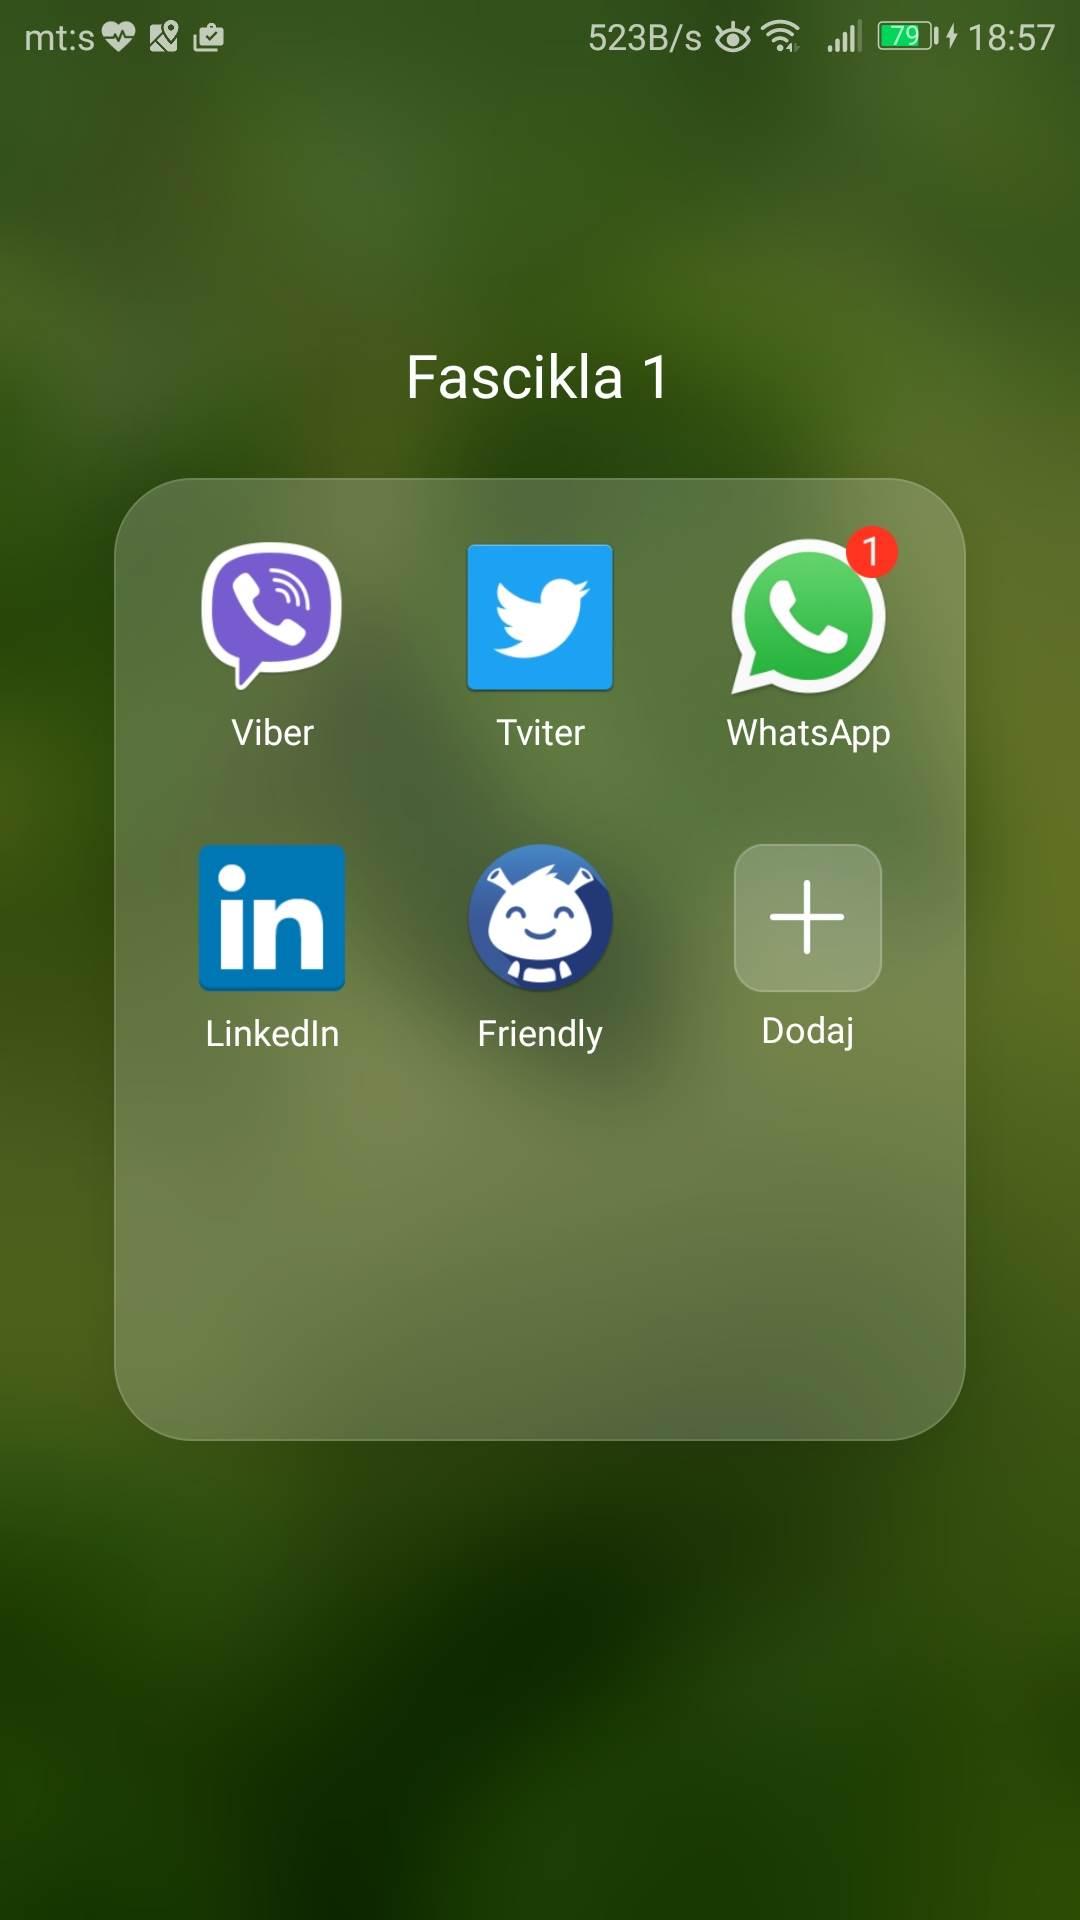 Kako promeniti Facebook boju (nije virus)